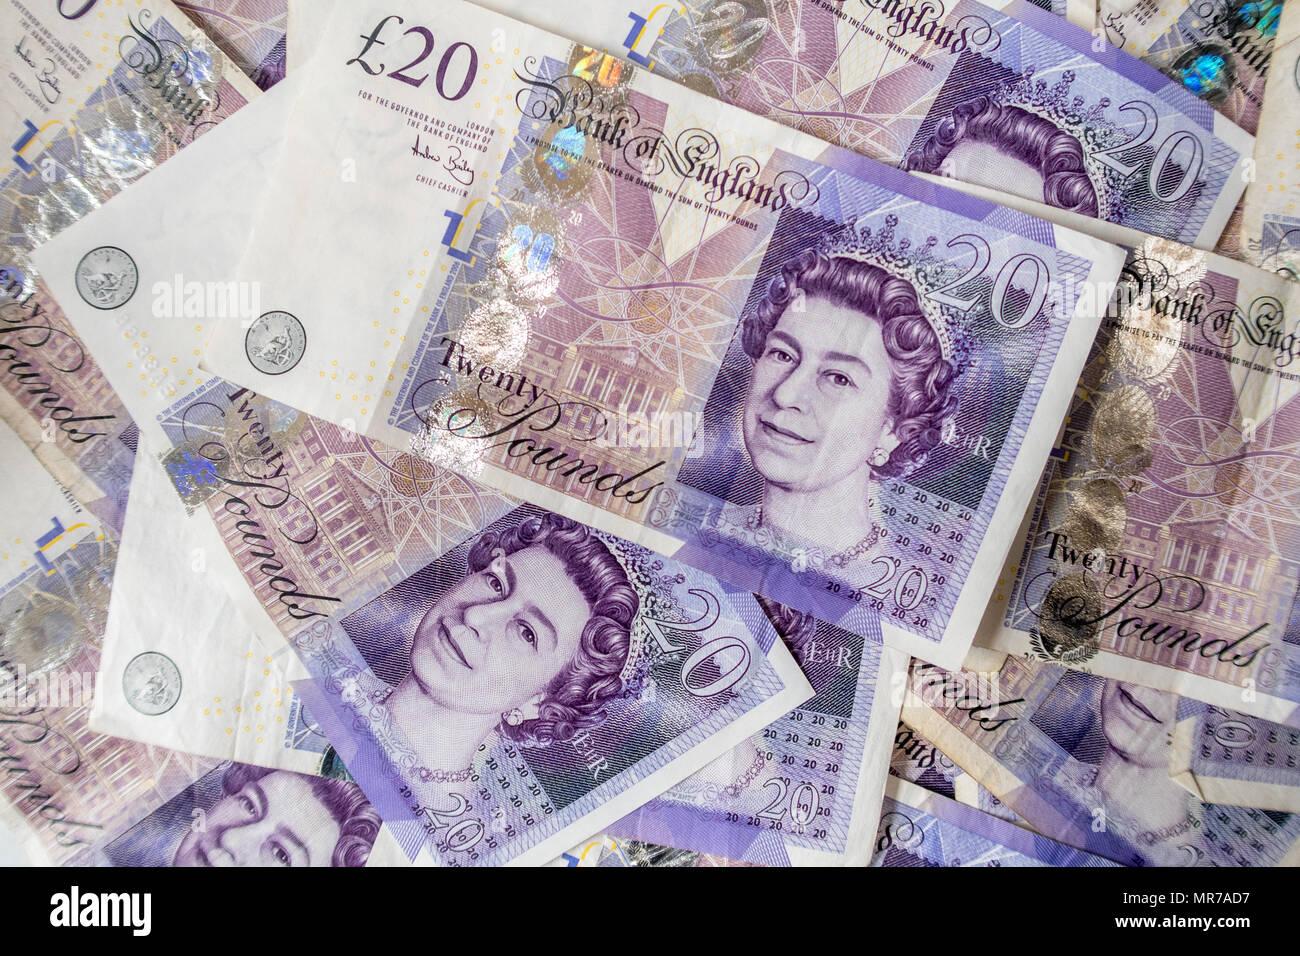 Background of a large pile of Twenty Pound bank notes - Stock Image